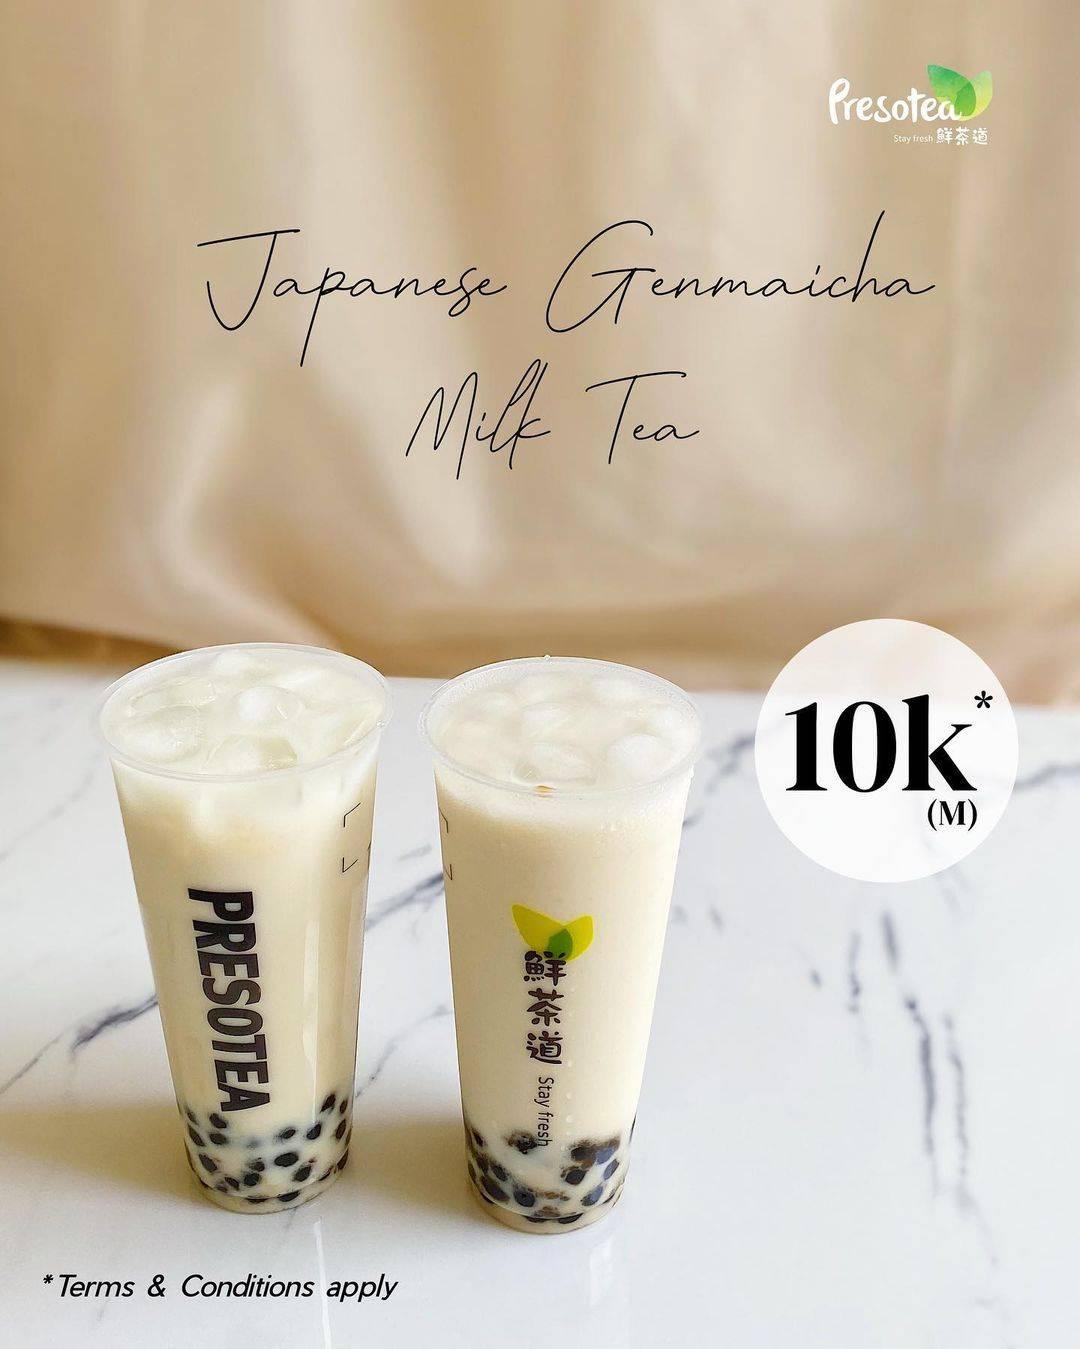 Diskon Preso Tea Promo Japanese Geinmaicha Milktea Hanya Rp. 10.000